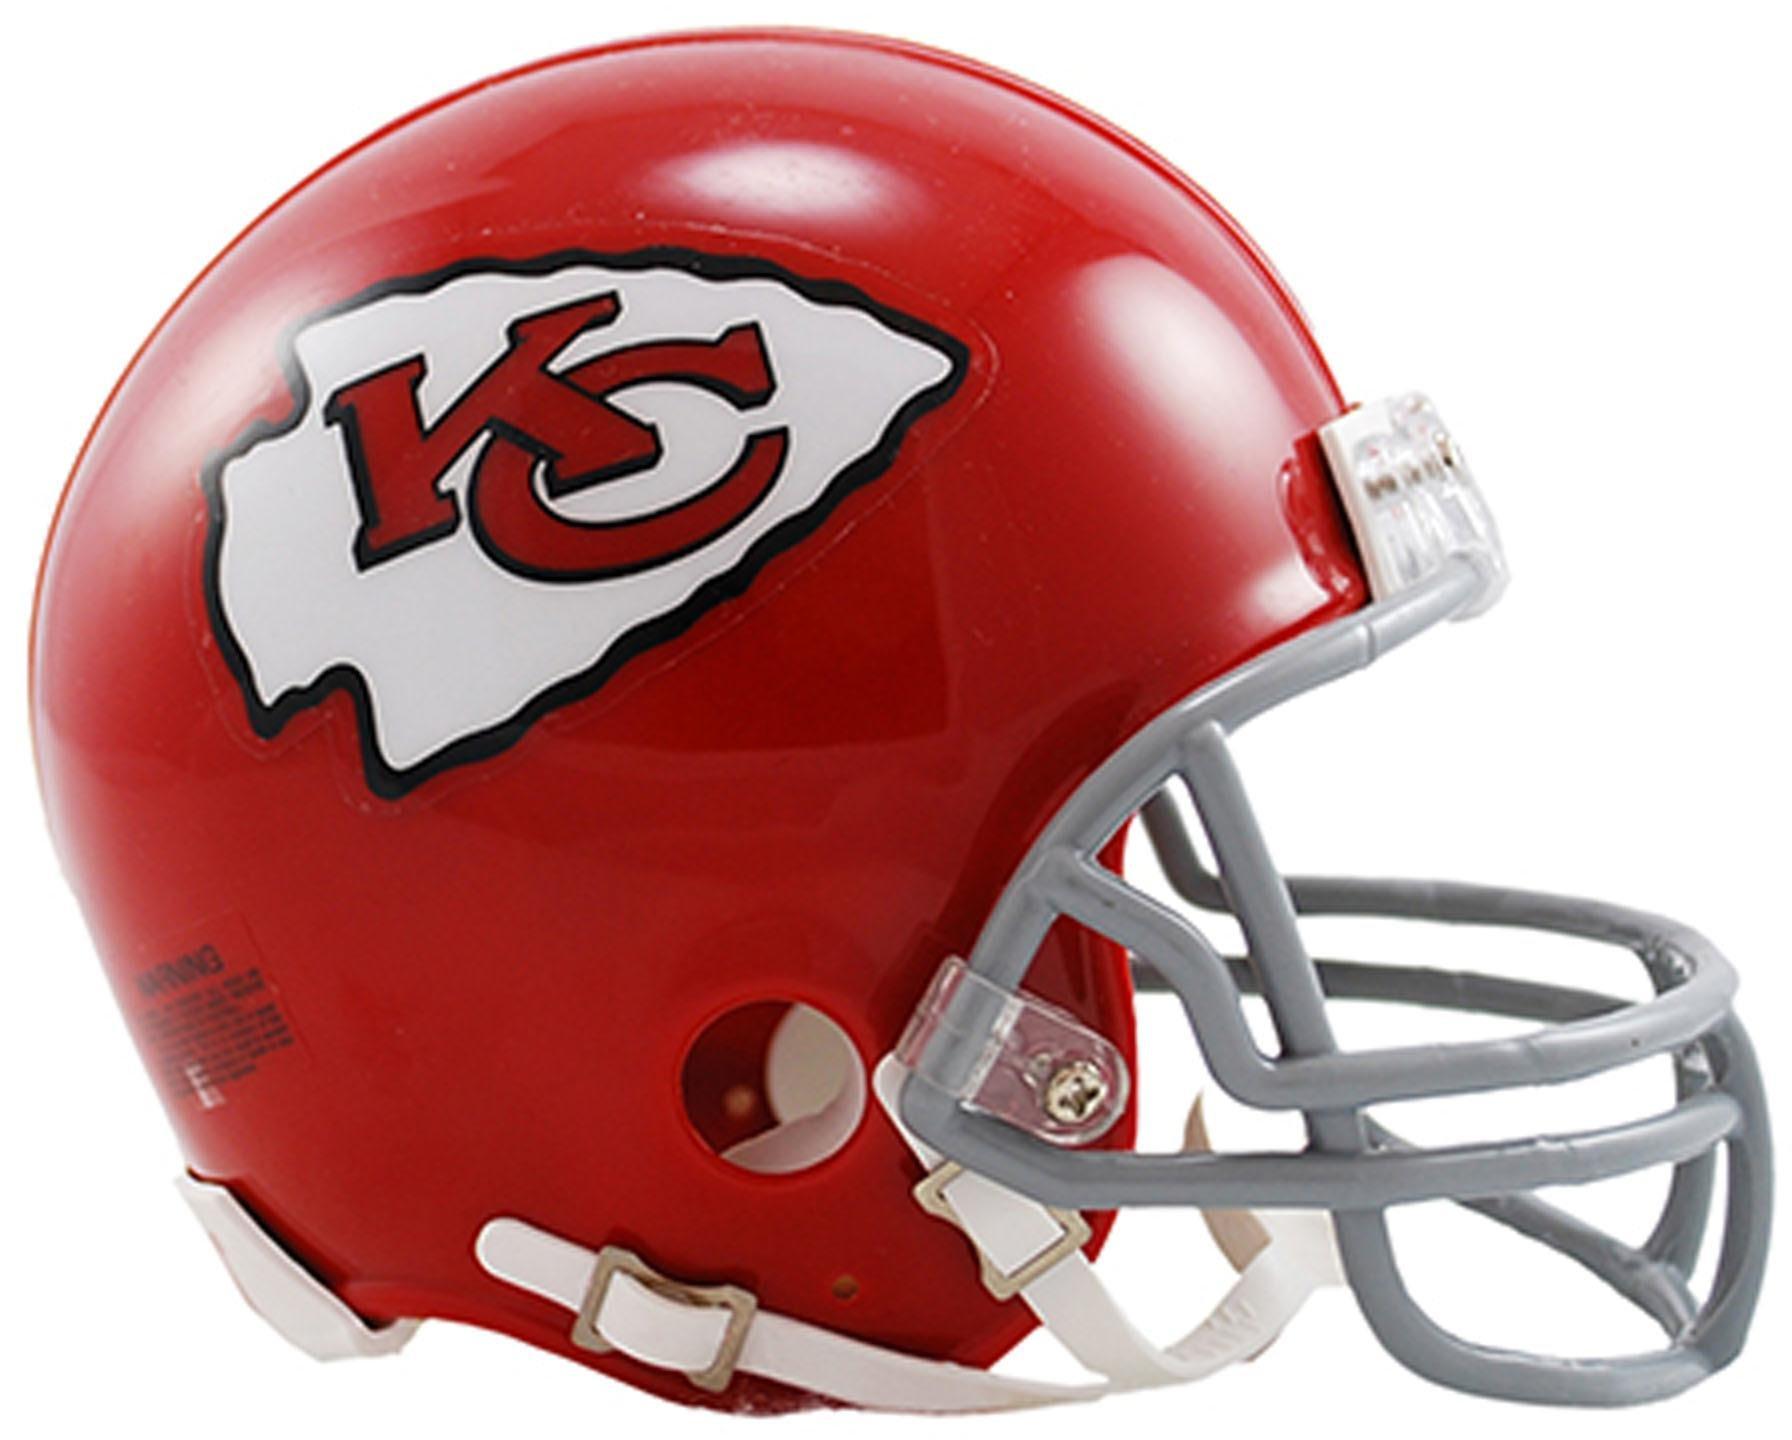 61cbe5e9e6b Get Quotations · Sports Memorabilia Riddell Kansas City Chiefs VSR4  Throwback 1963-1973 Mini Football Helmet - Fanatics